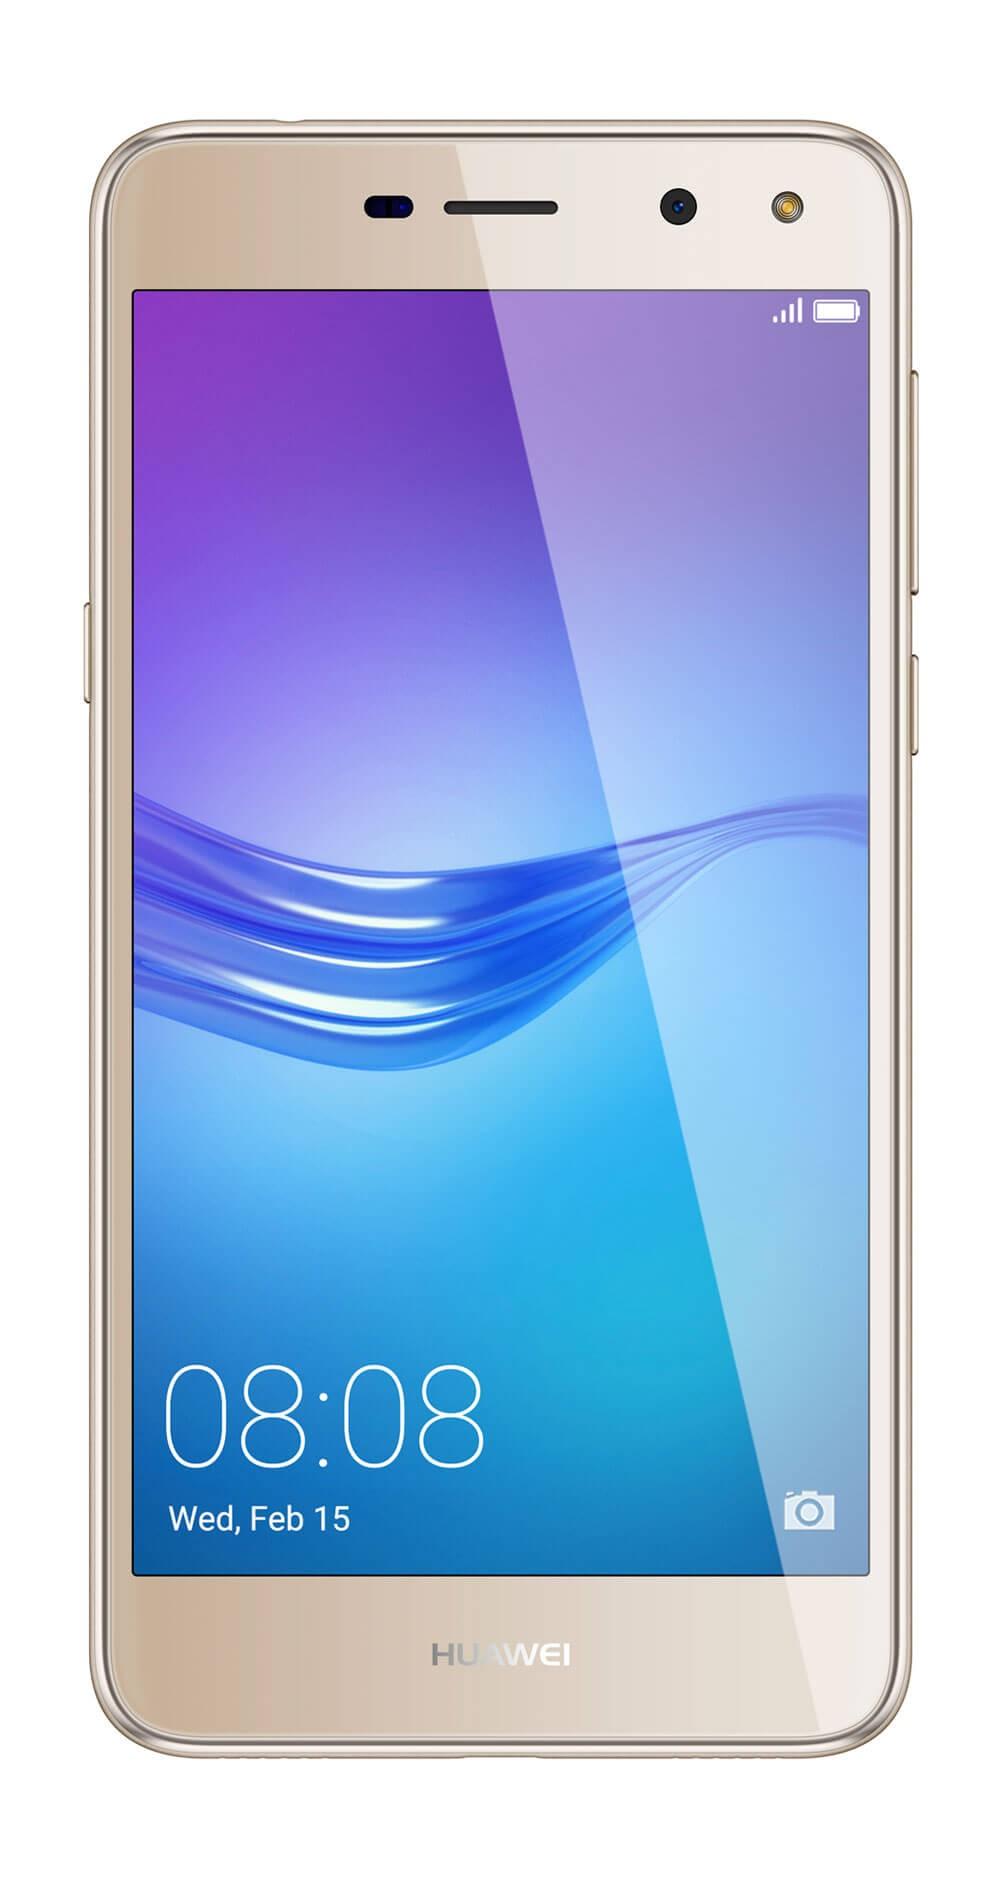 Huawei Y5 2017 4G